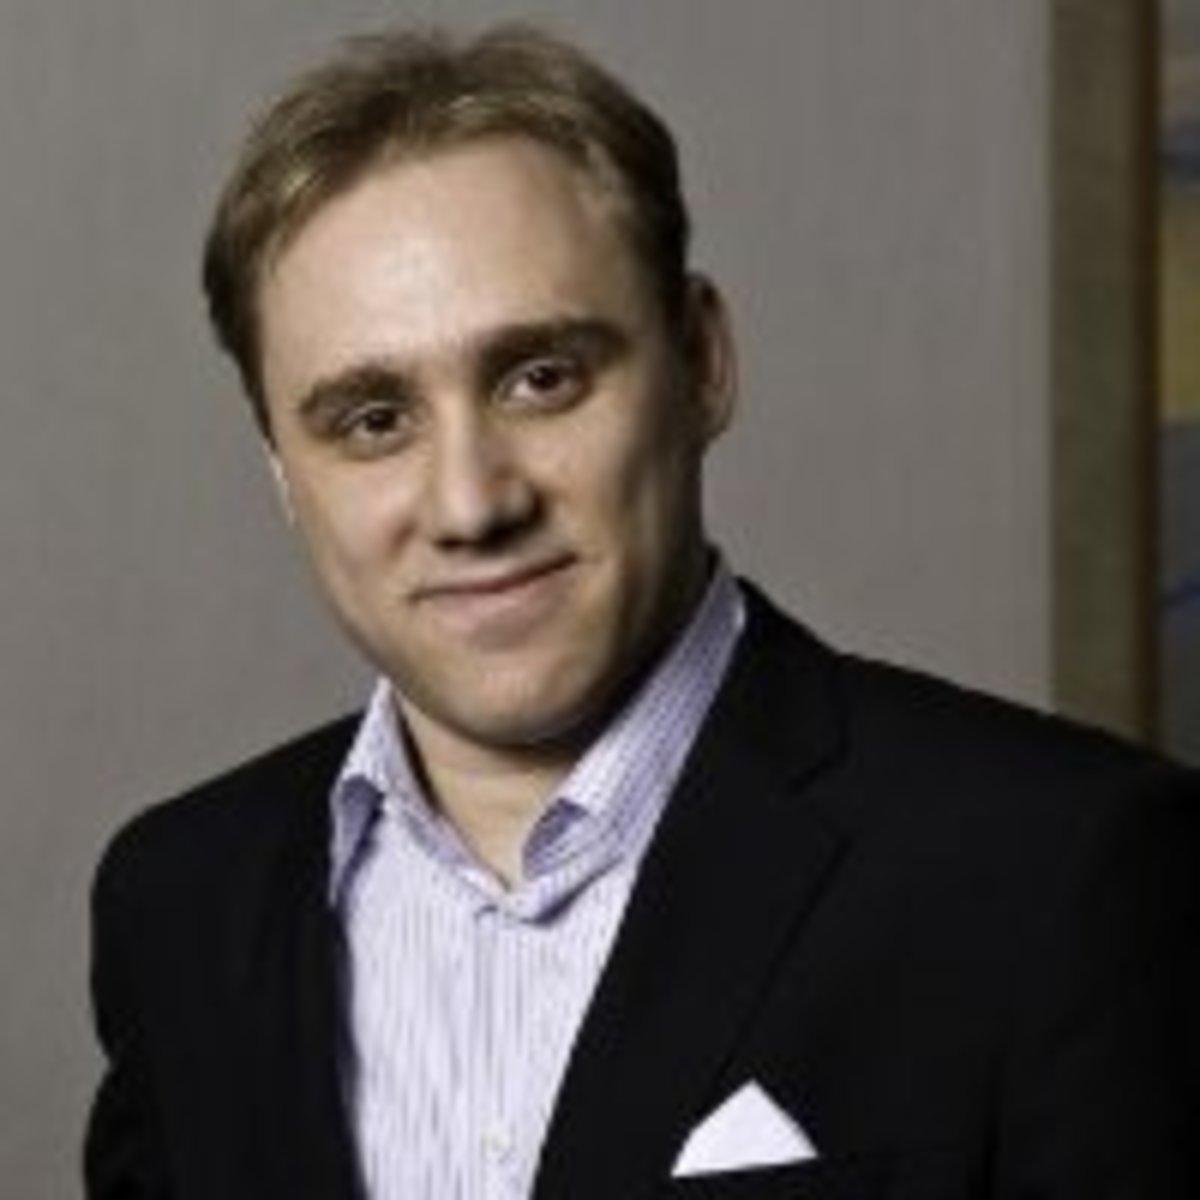 Dmitri Alperovitch, CTO of CrowdStrike